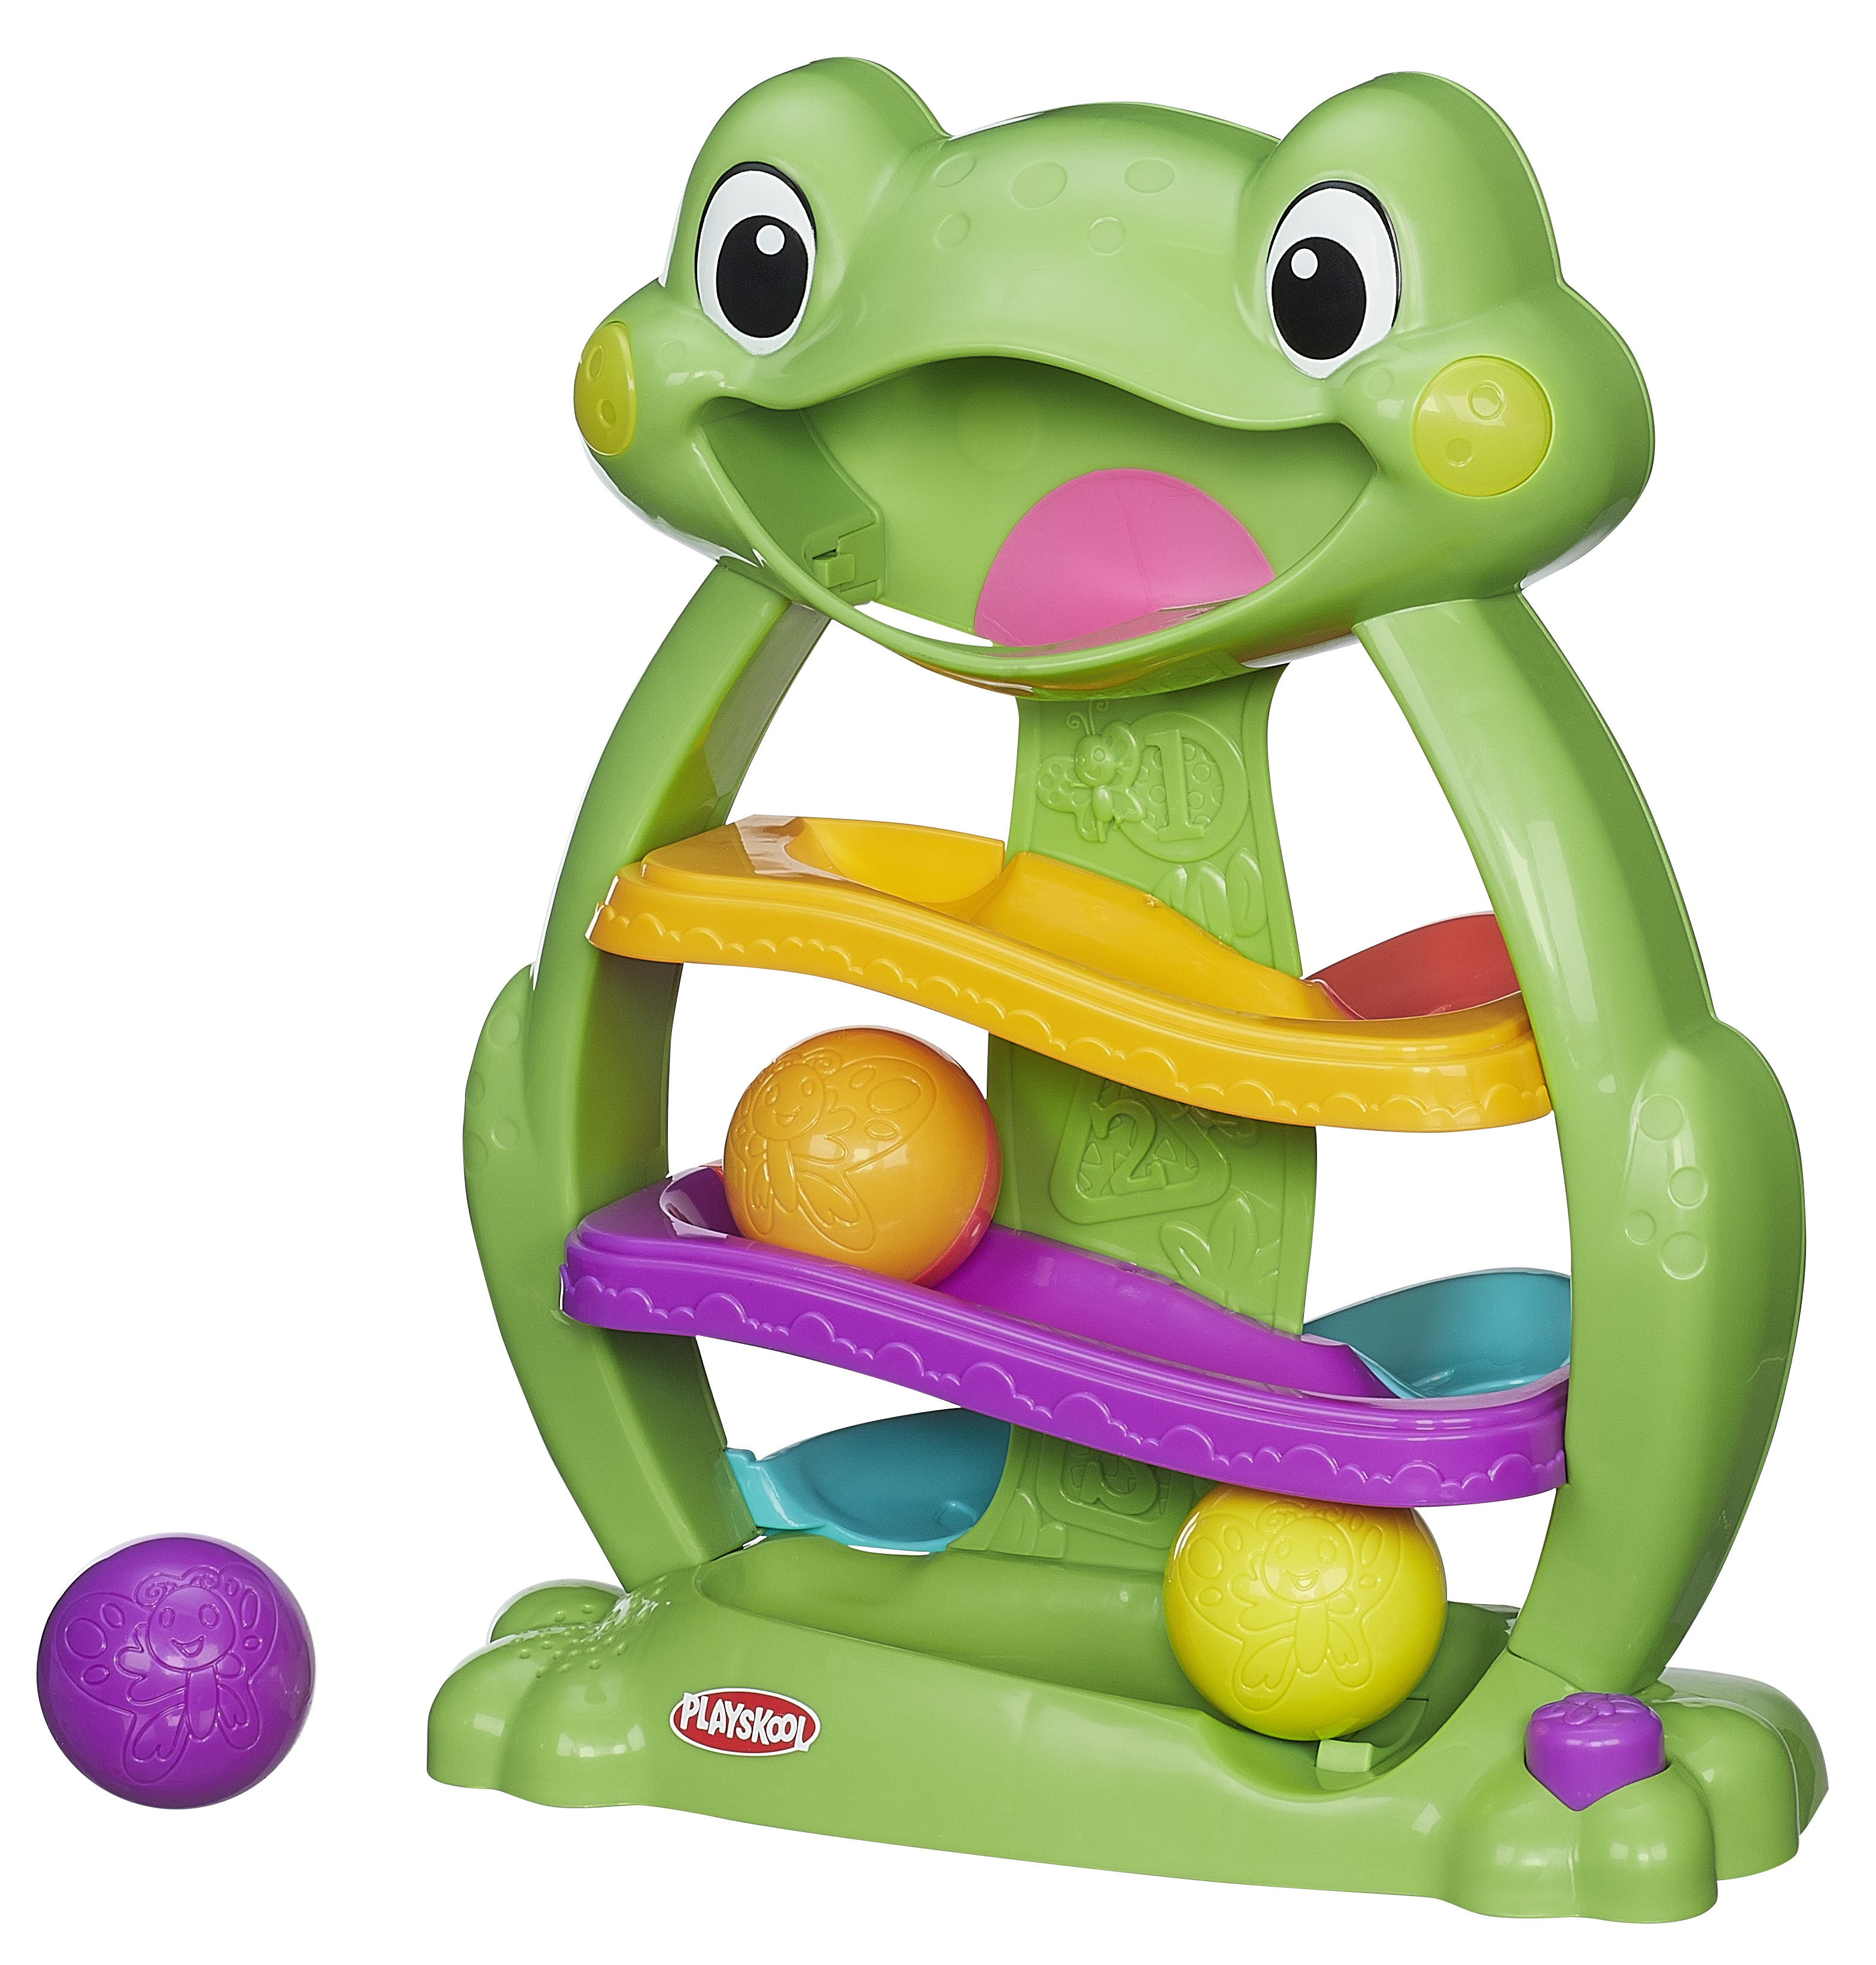 Holiday gift idea: Tumble n Glow Froggio